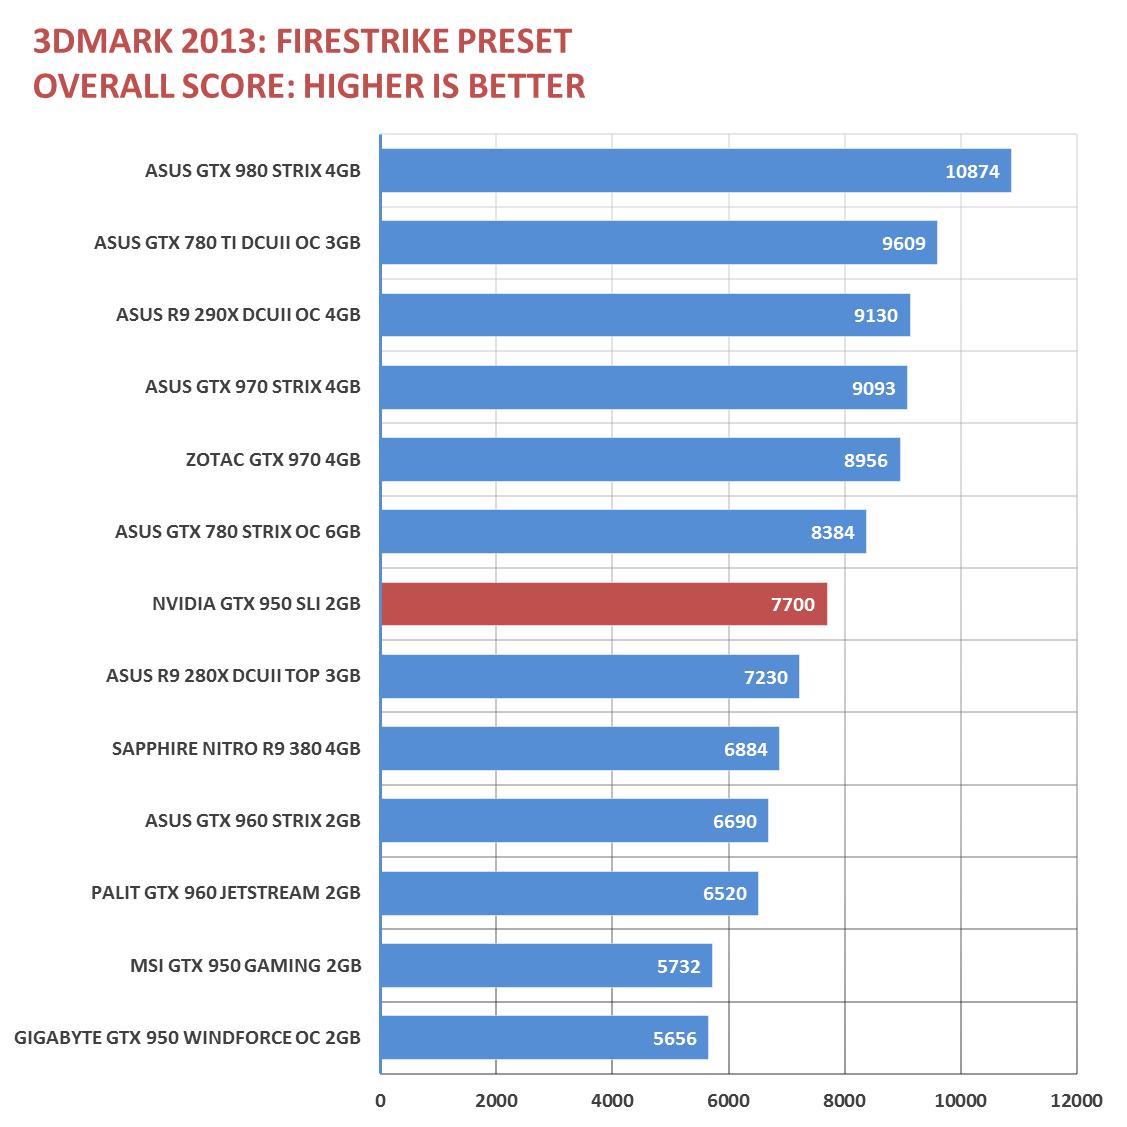 Nvidia GeForce GTX 950 SLI Performance | TechPorn